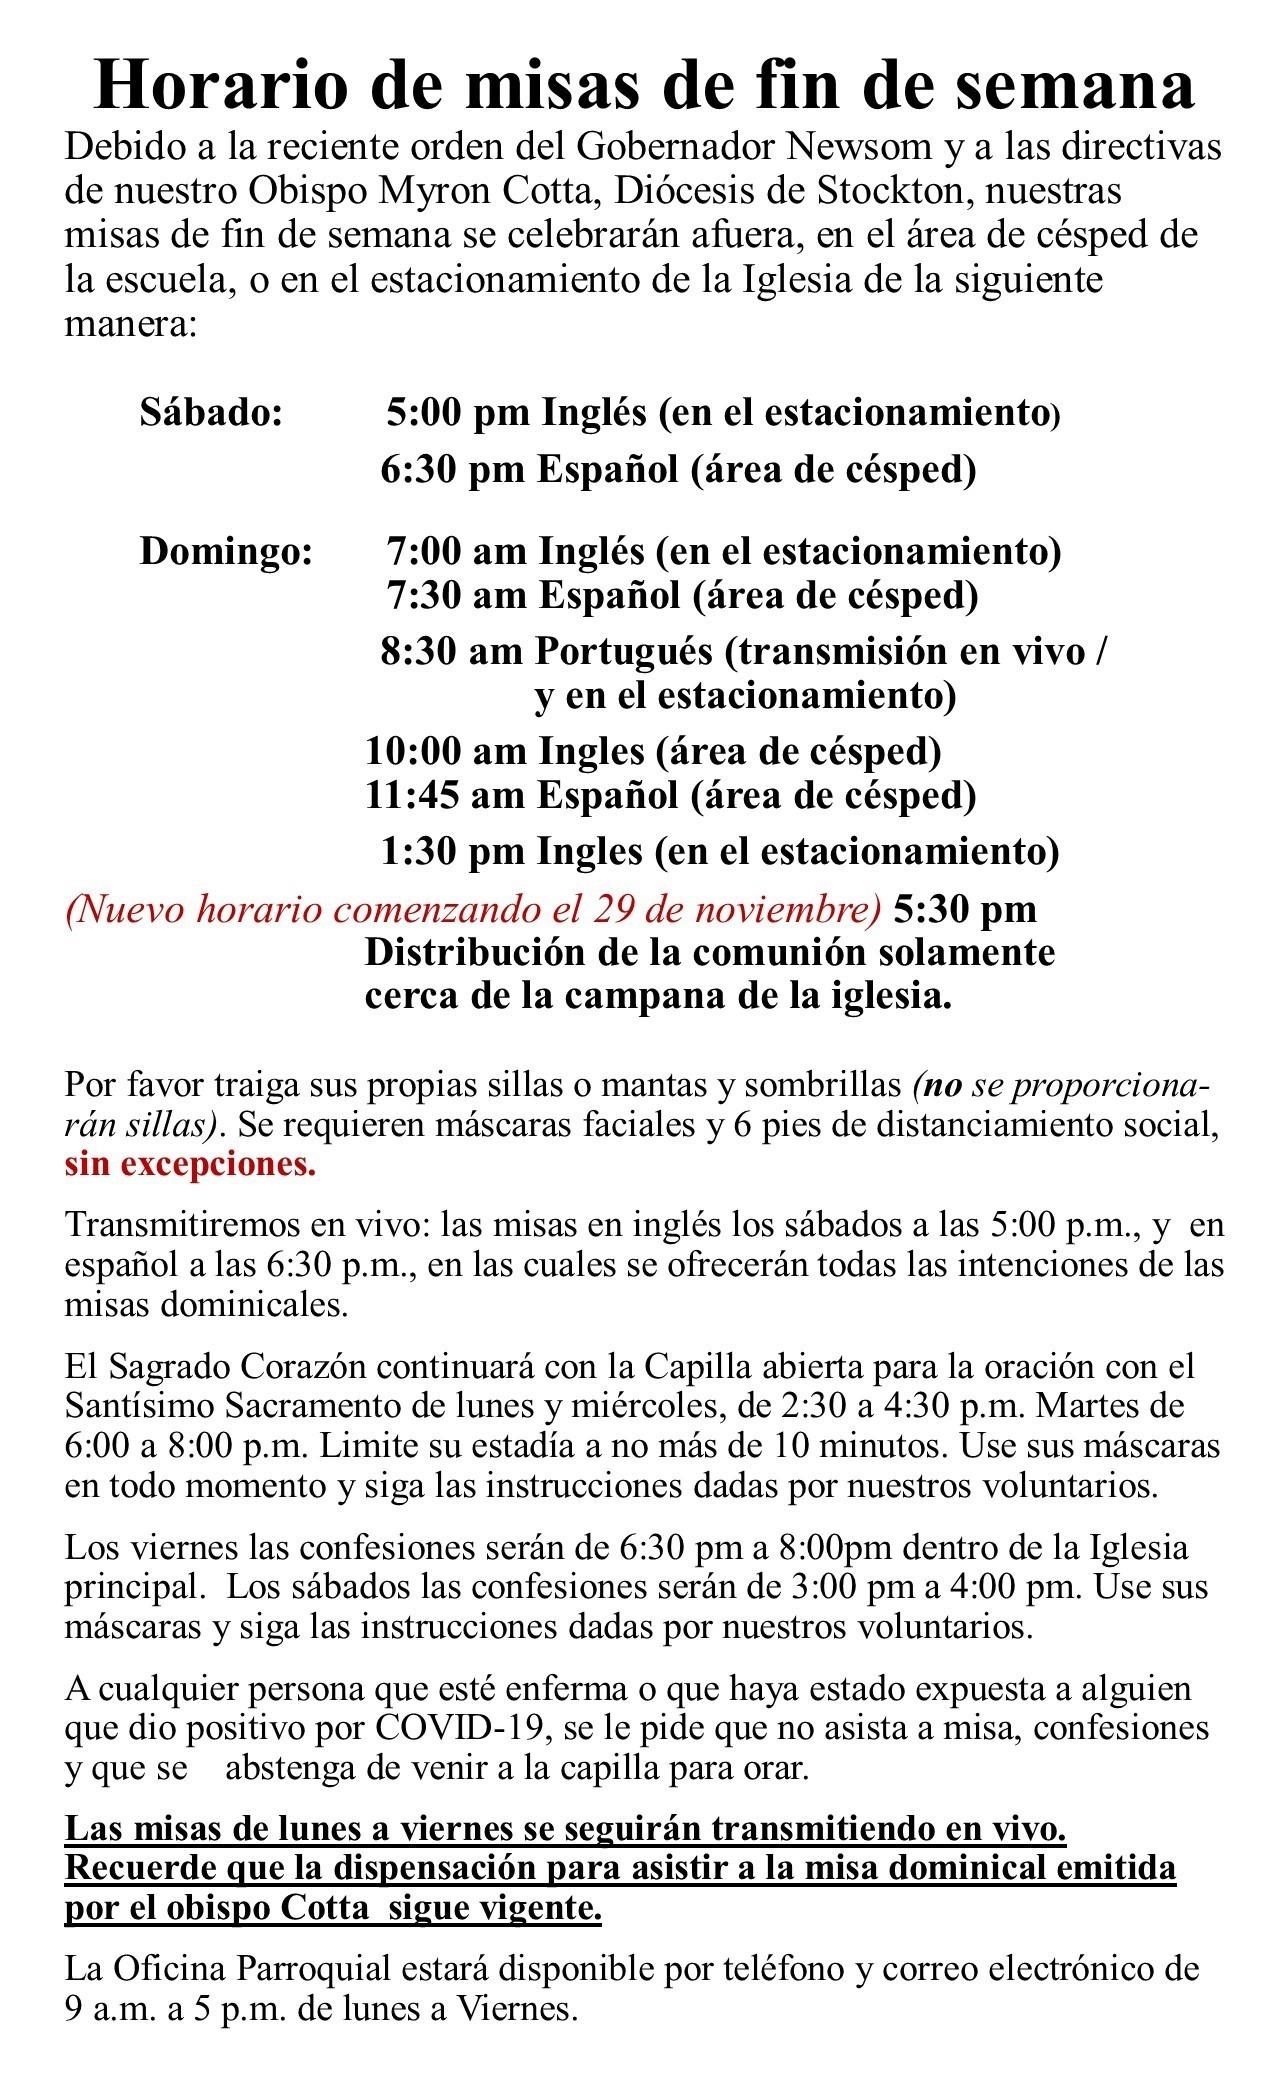 New Directives Spanish 11 2020